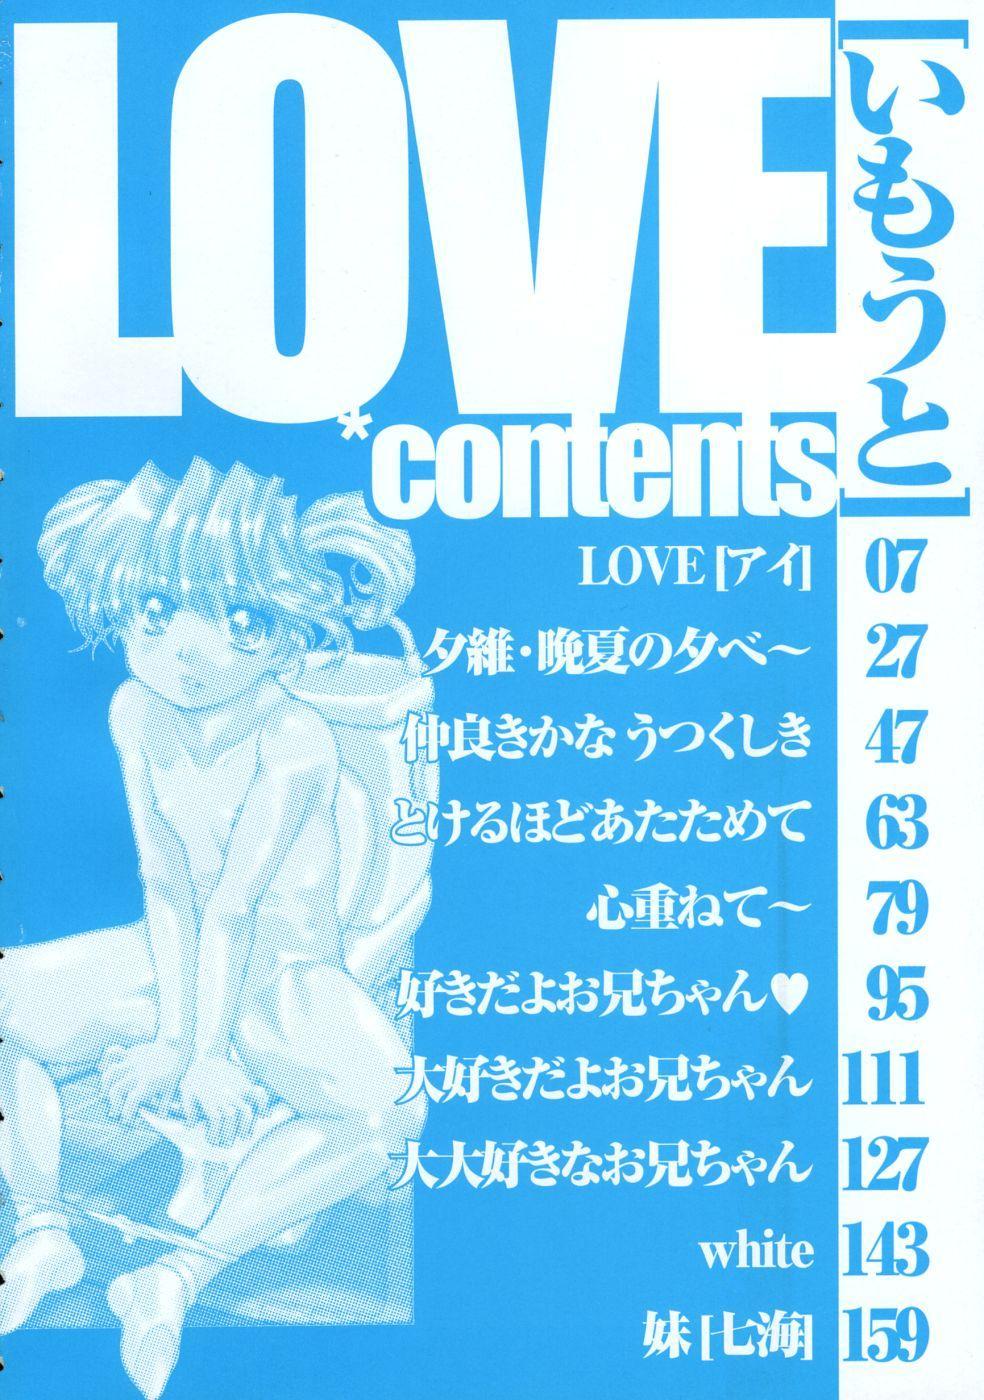 LOVE 'Imouto' 7